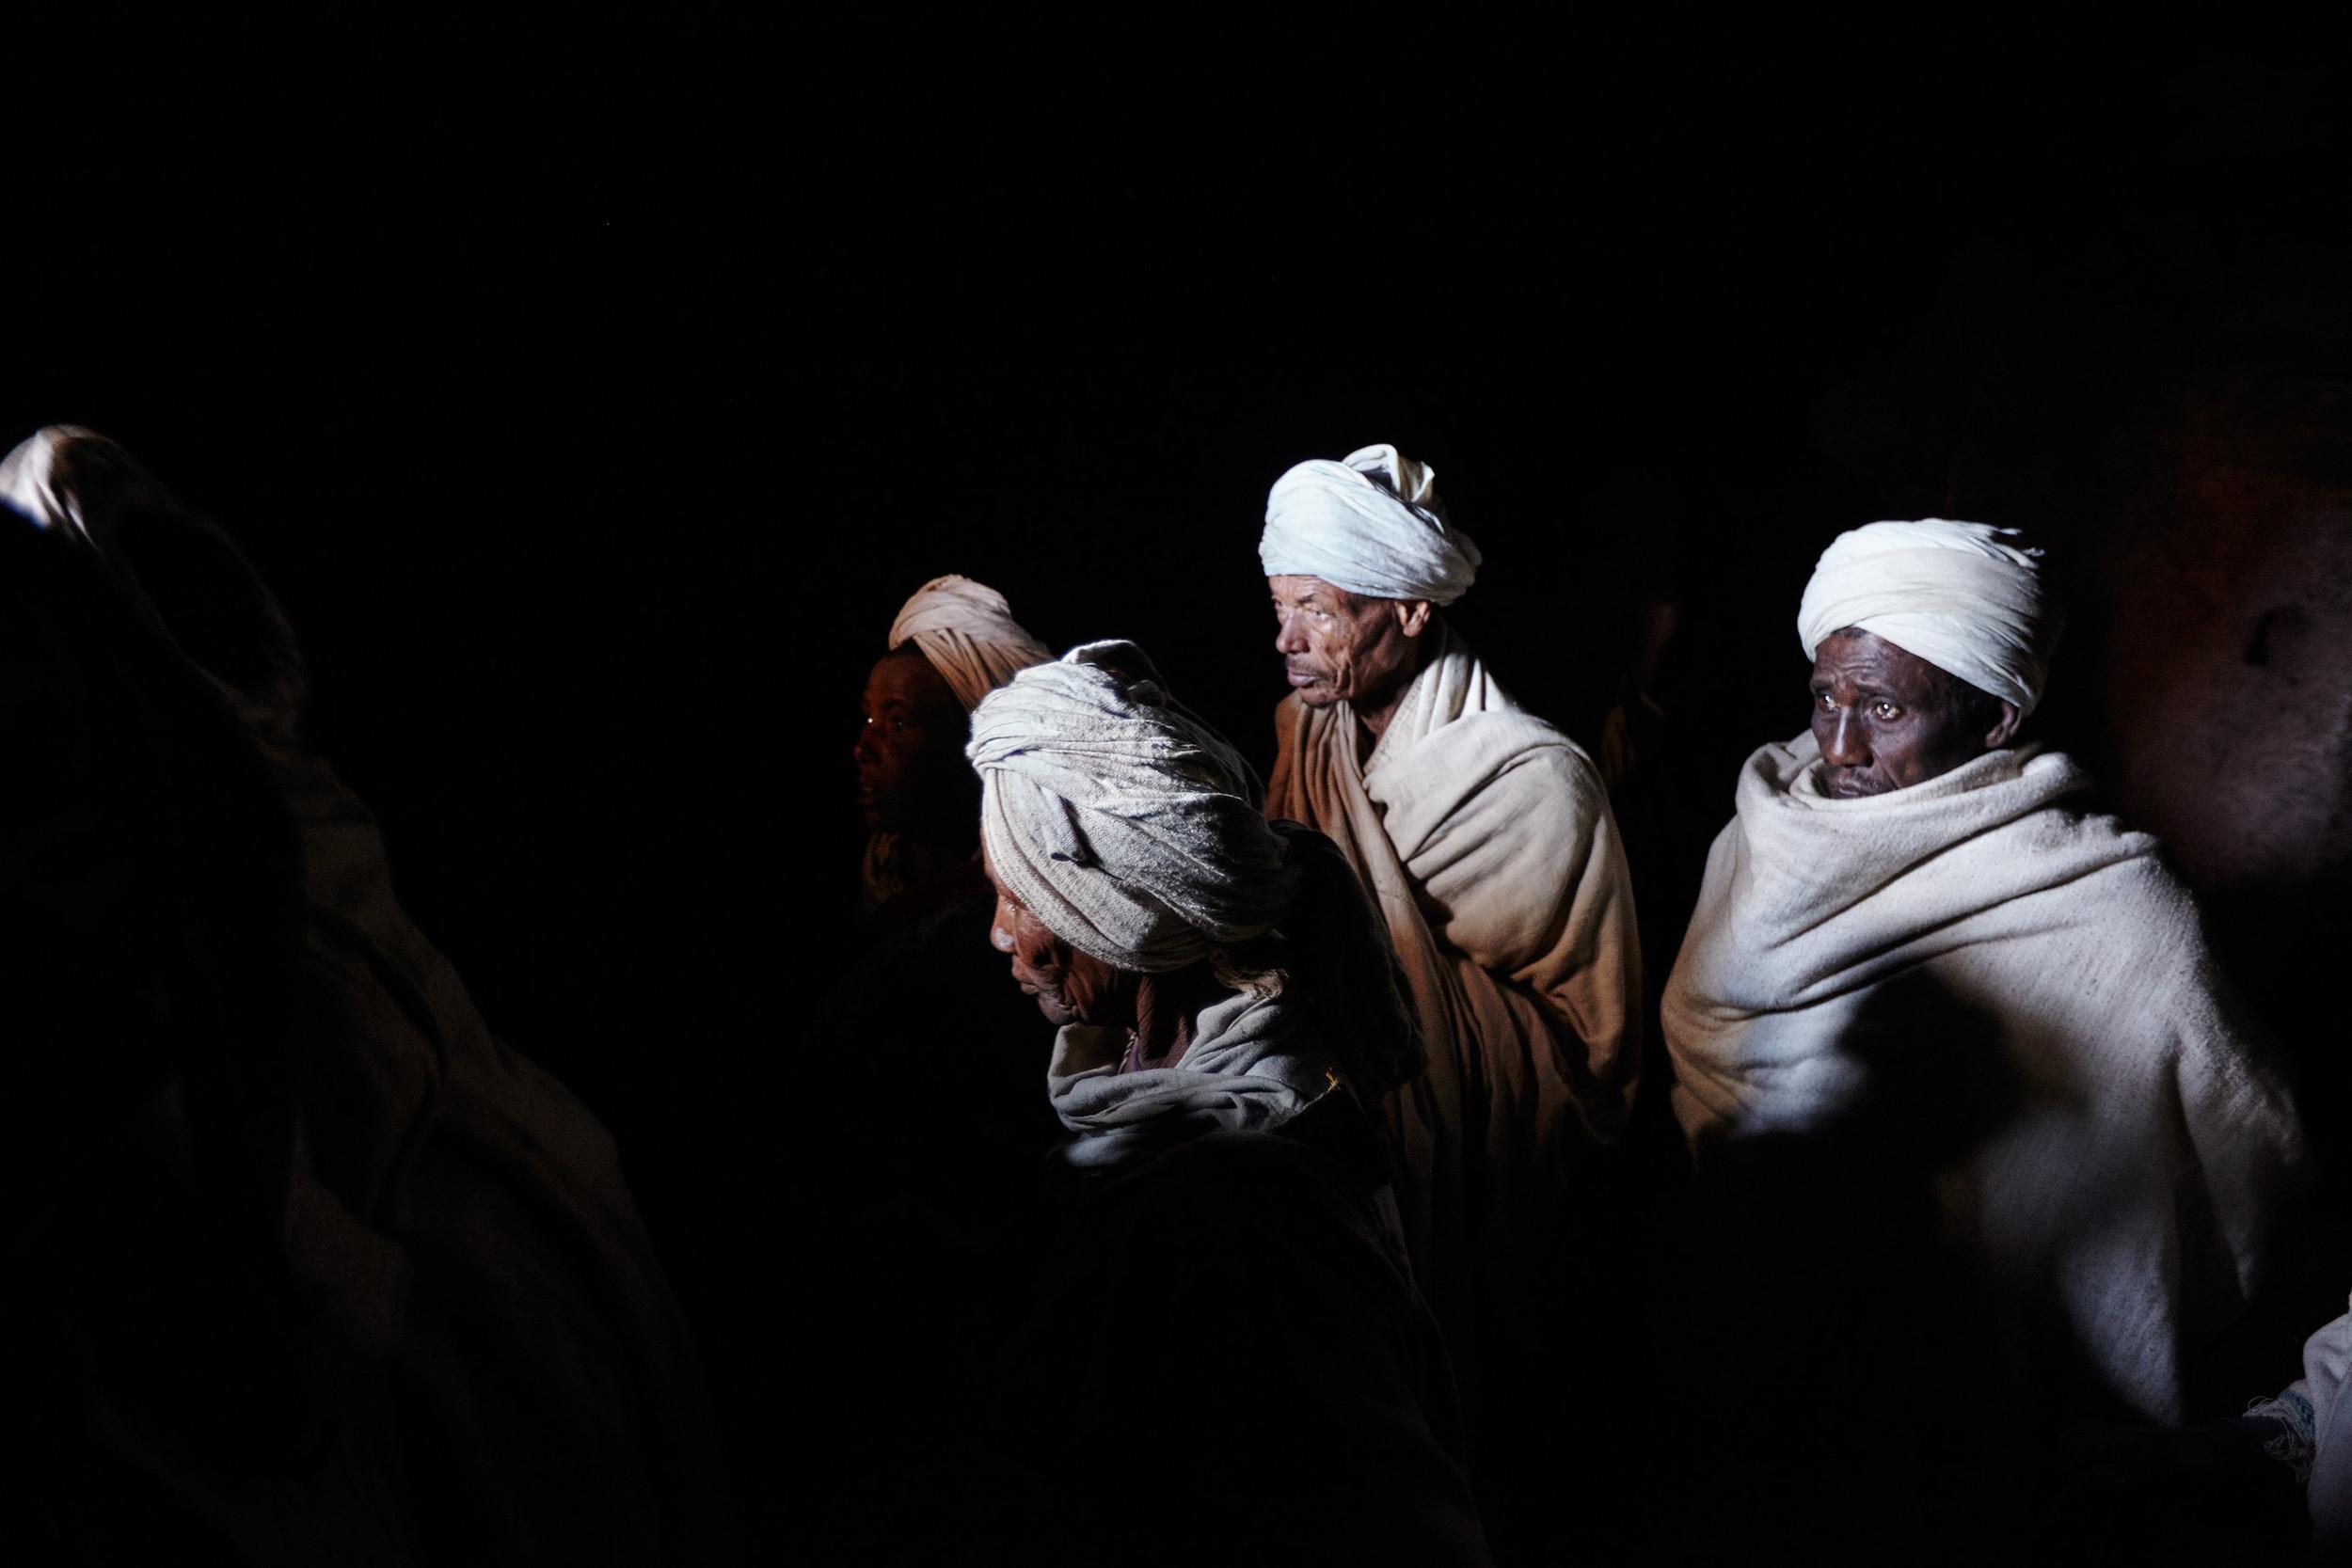 Lalibela, Ethiopia 2012 | Canon 5D MKIII, 16-35mm f/2.8 @ 25mm, ISO 3200, f/2.8, 1/25s